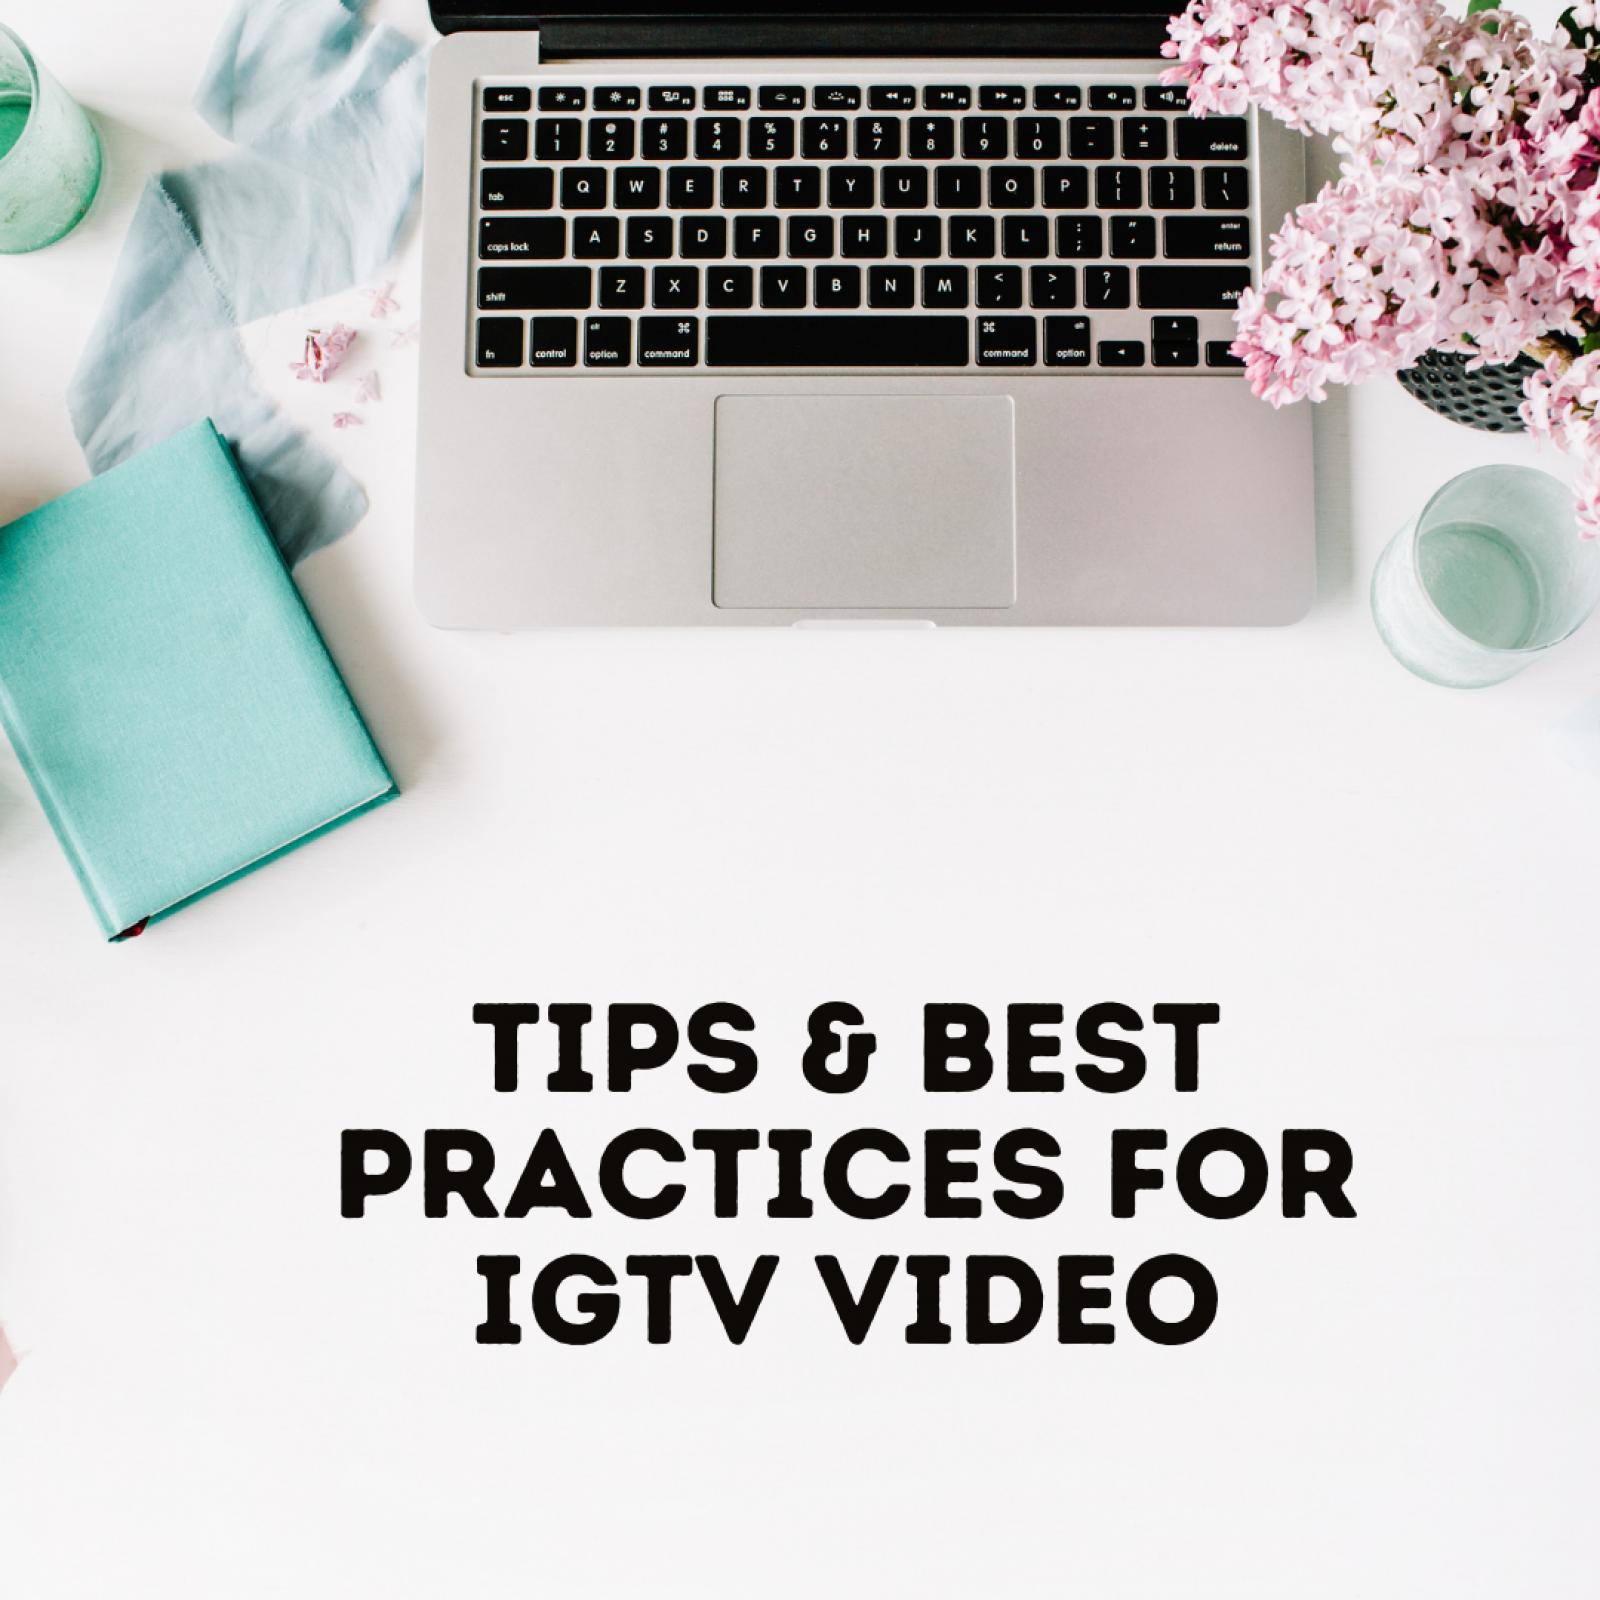 igtv video